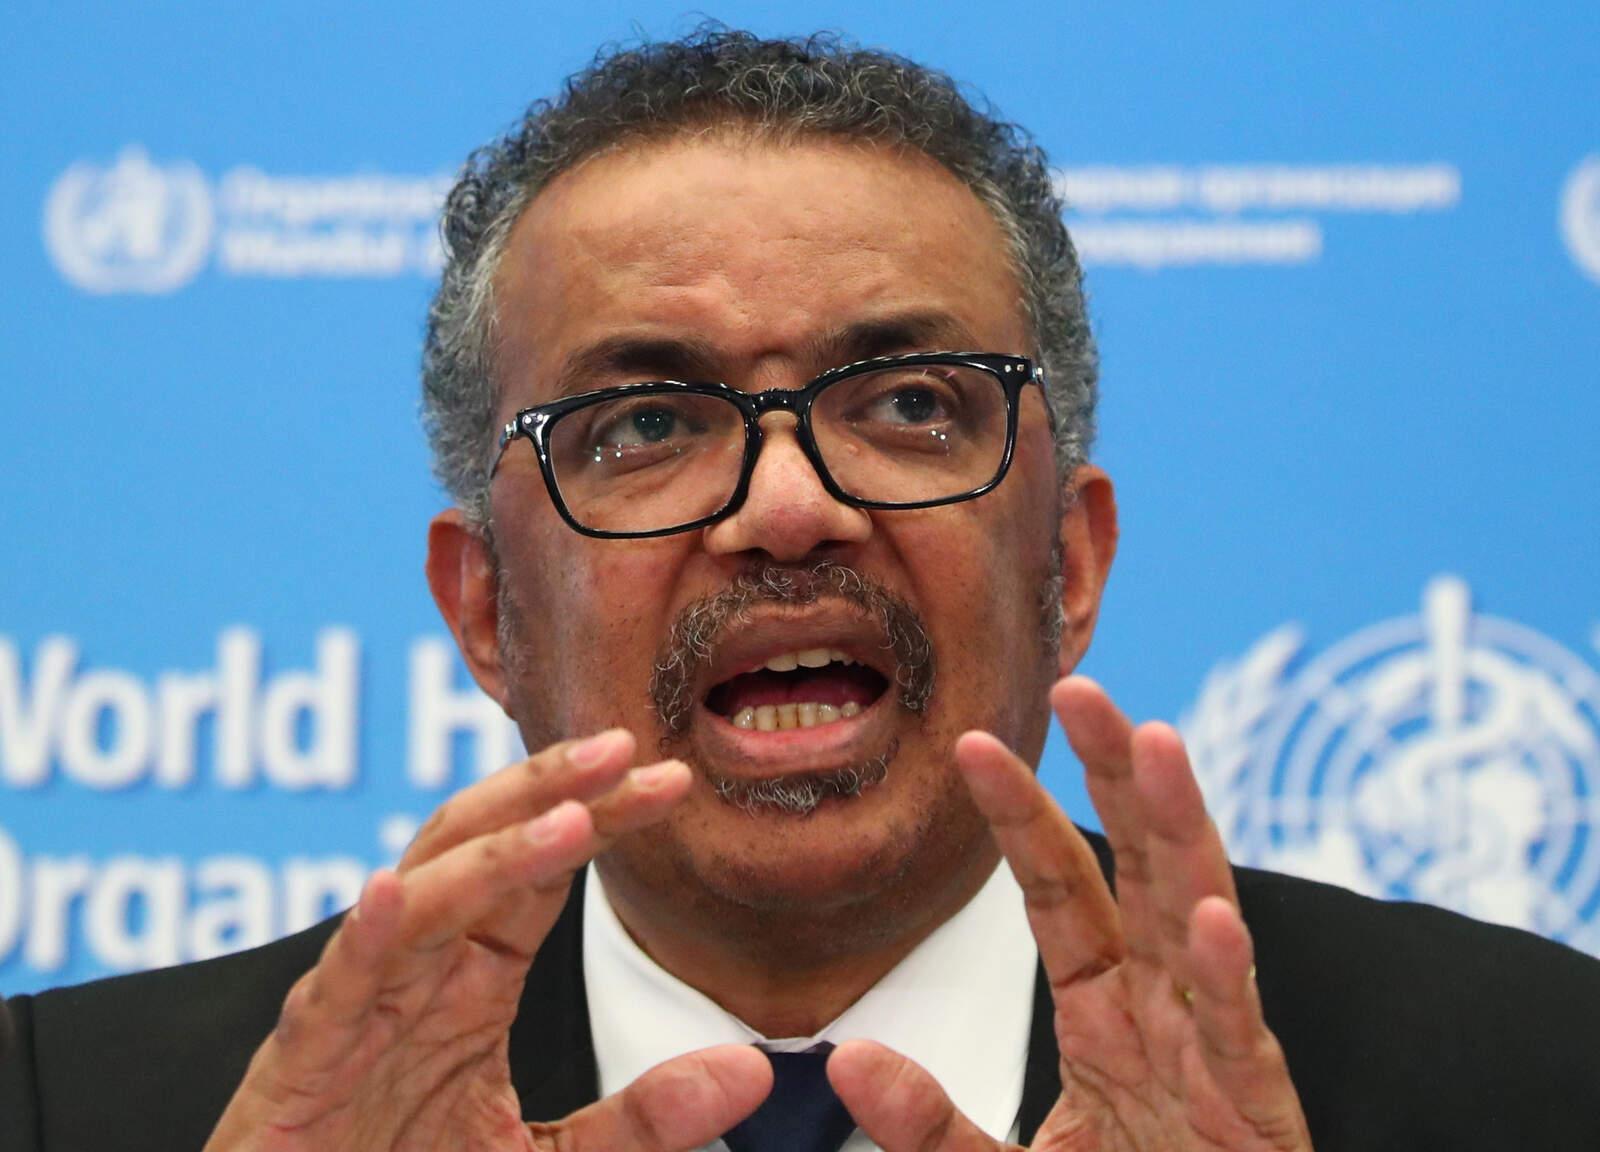 El director general de l'Organització Mundial de la Salut (OMS), l'etíop Tedros Adhanom Ghebreyesus,